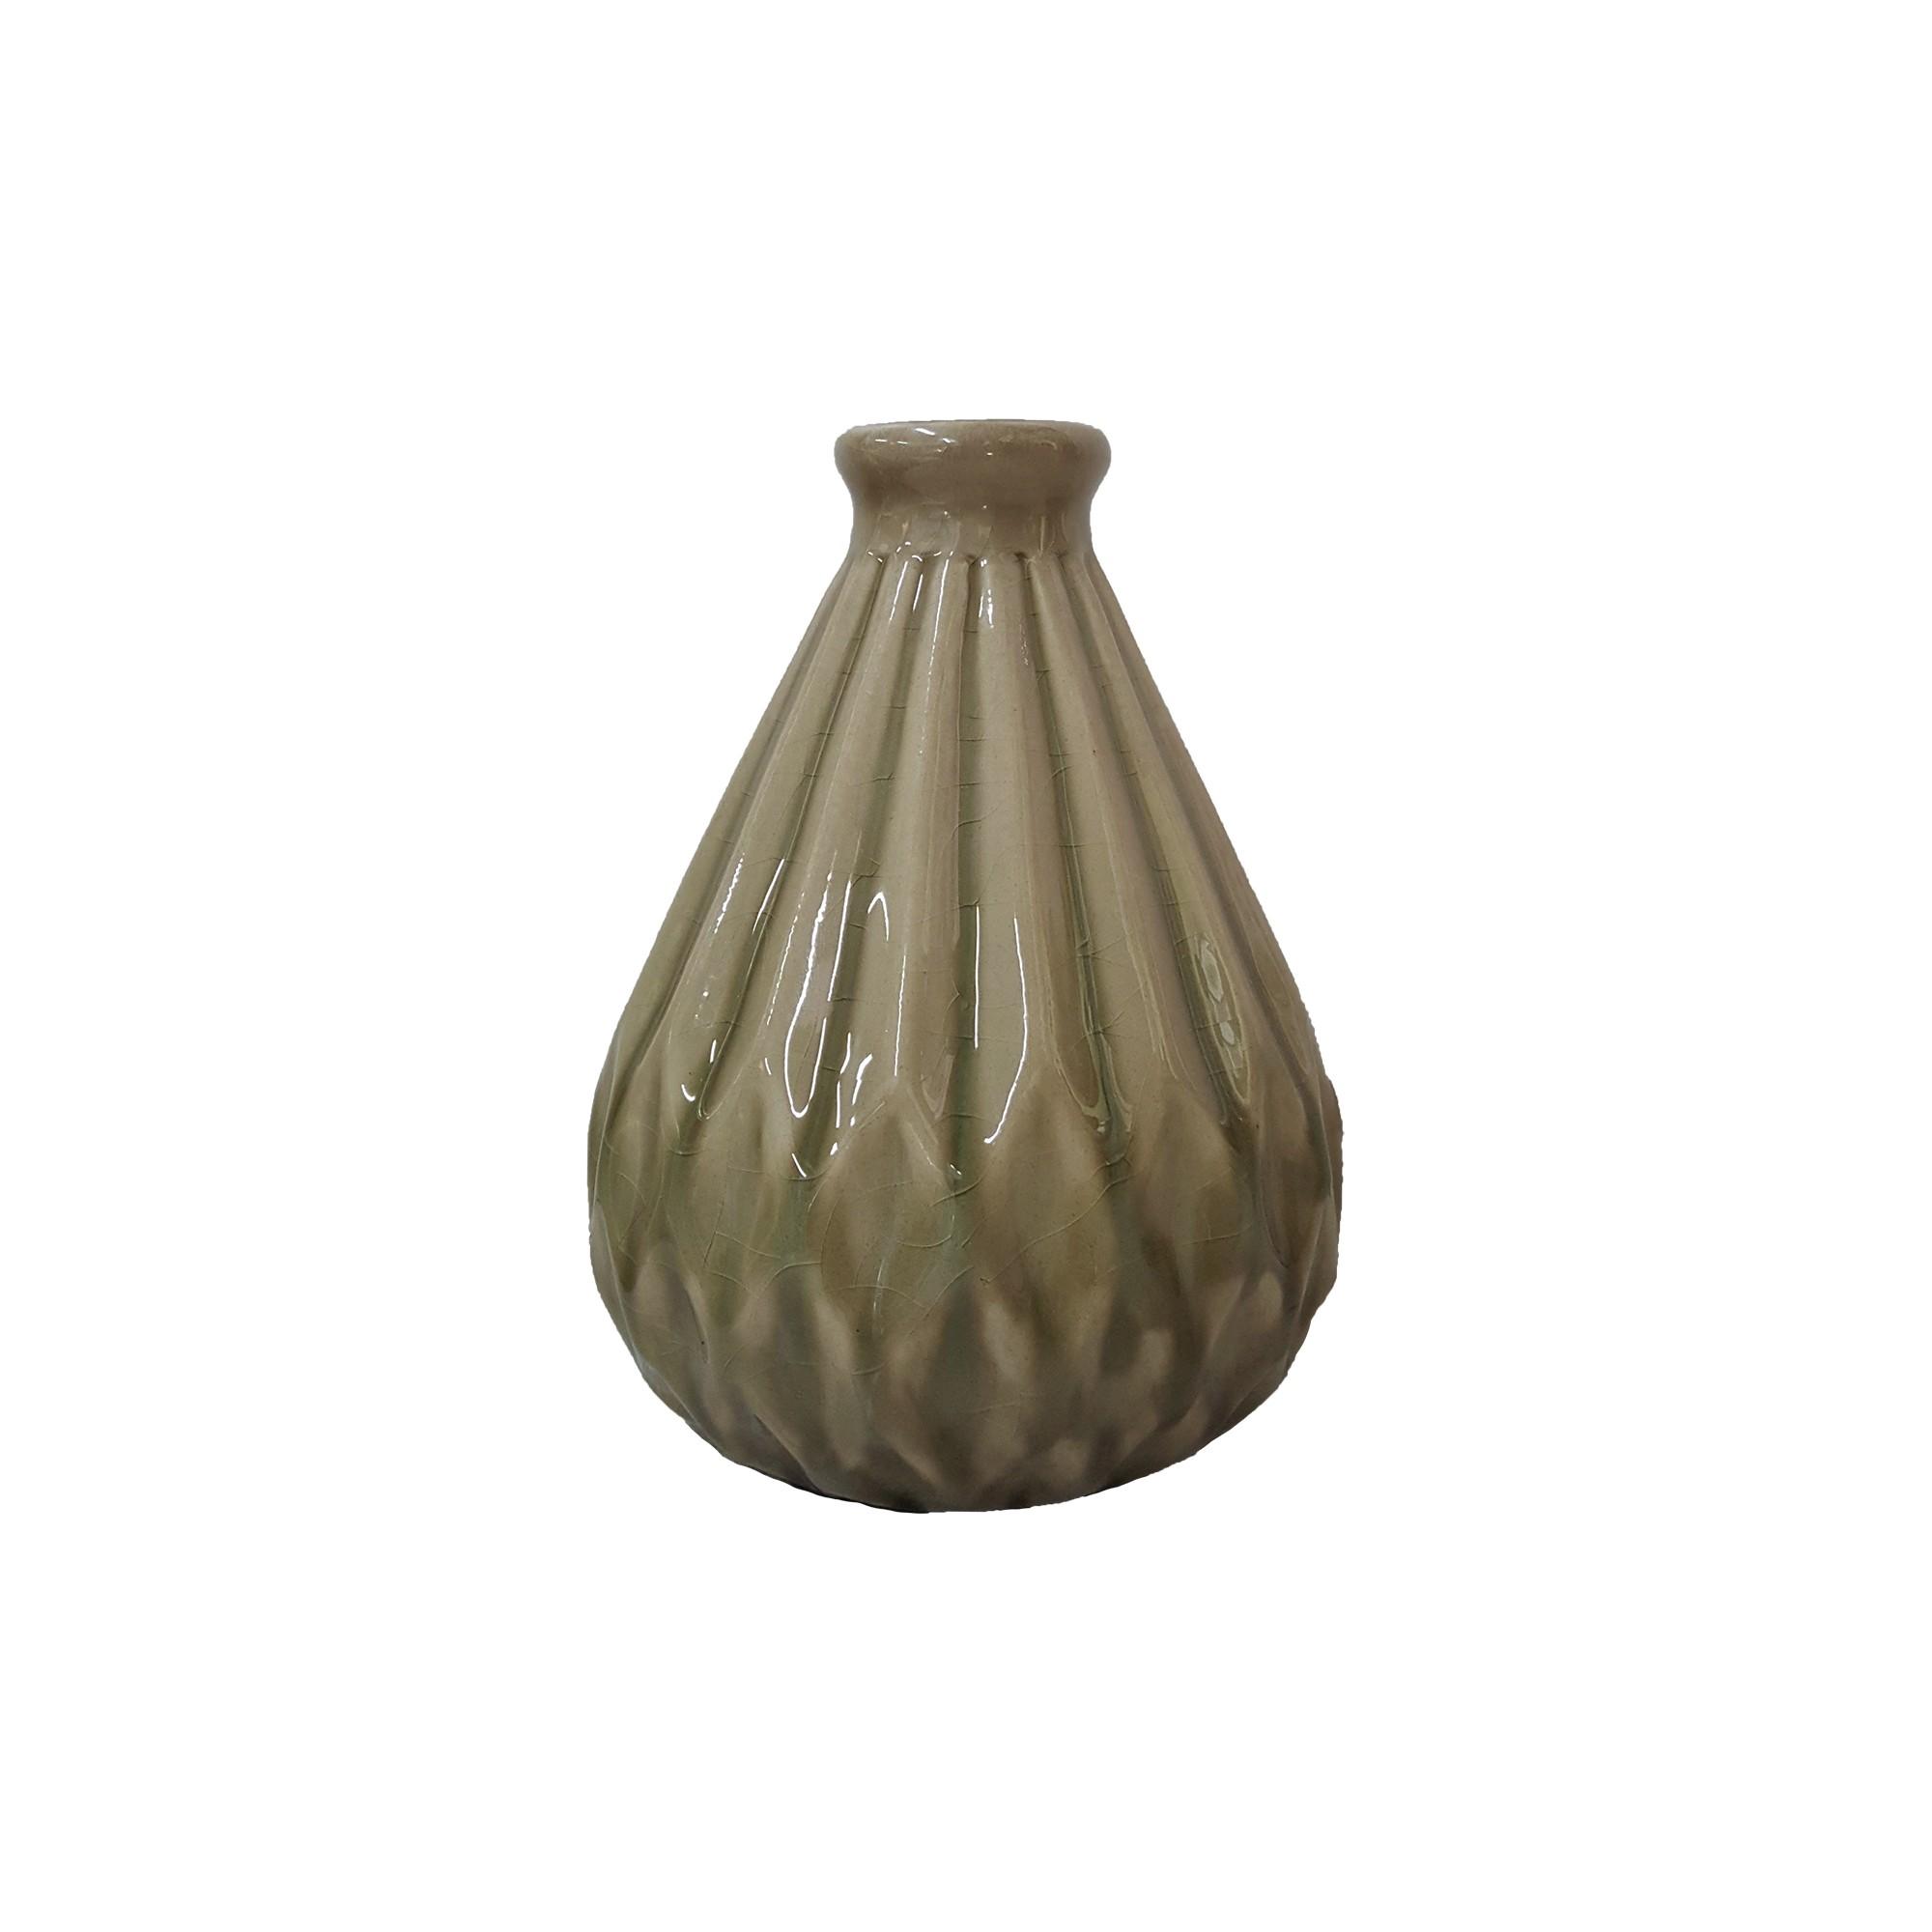 Vaso Decorativo Ceramica Redondo Fendi 4778950 - Buzzios